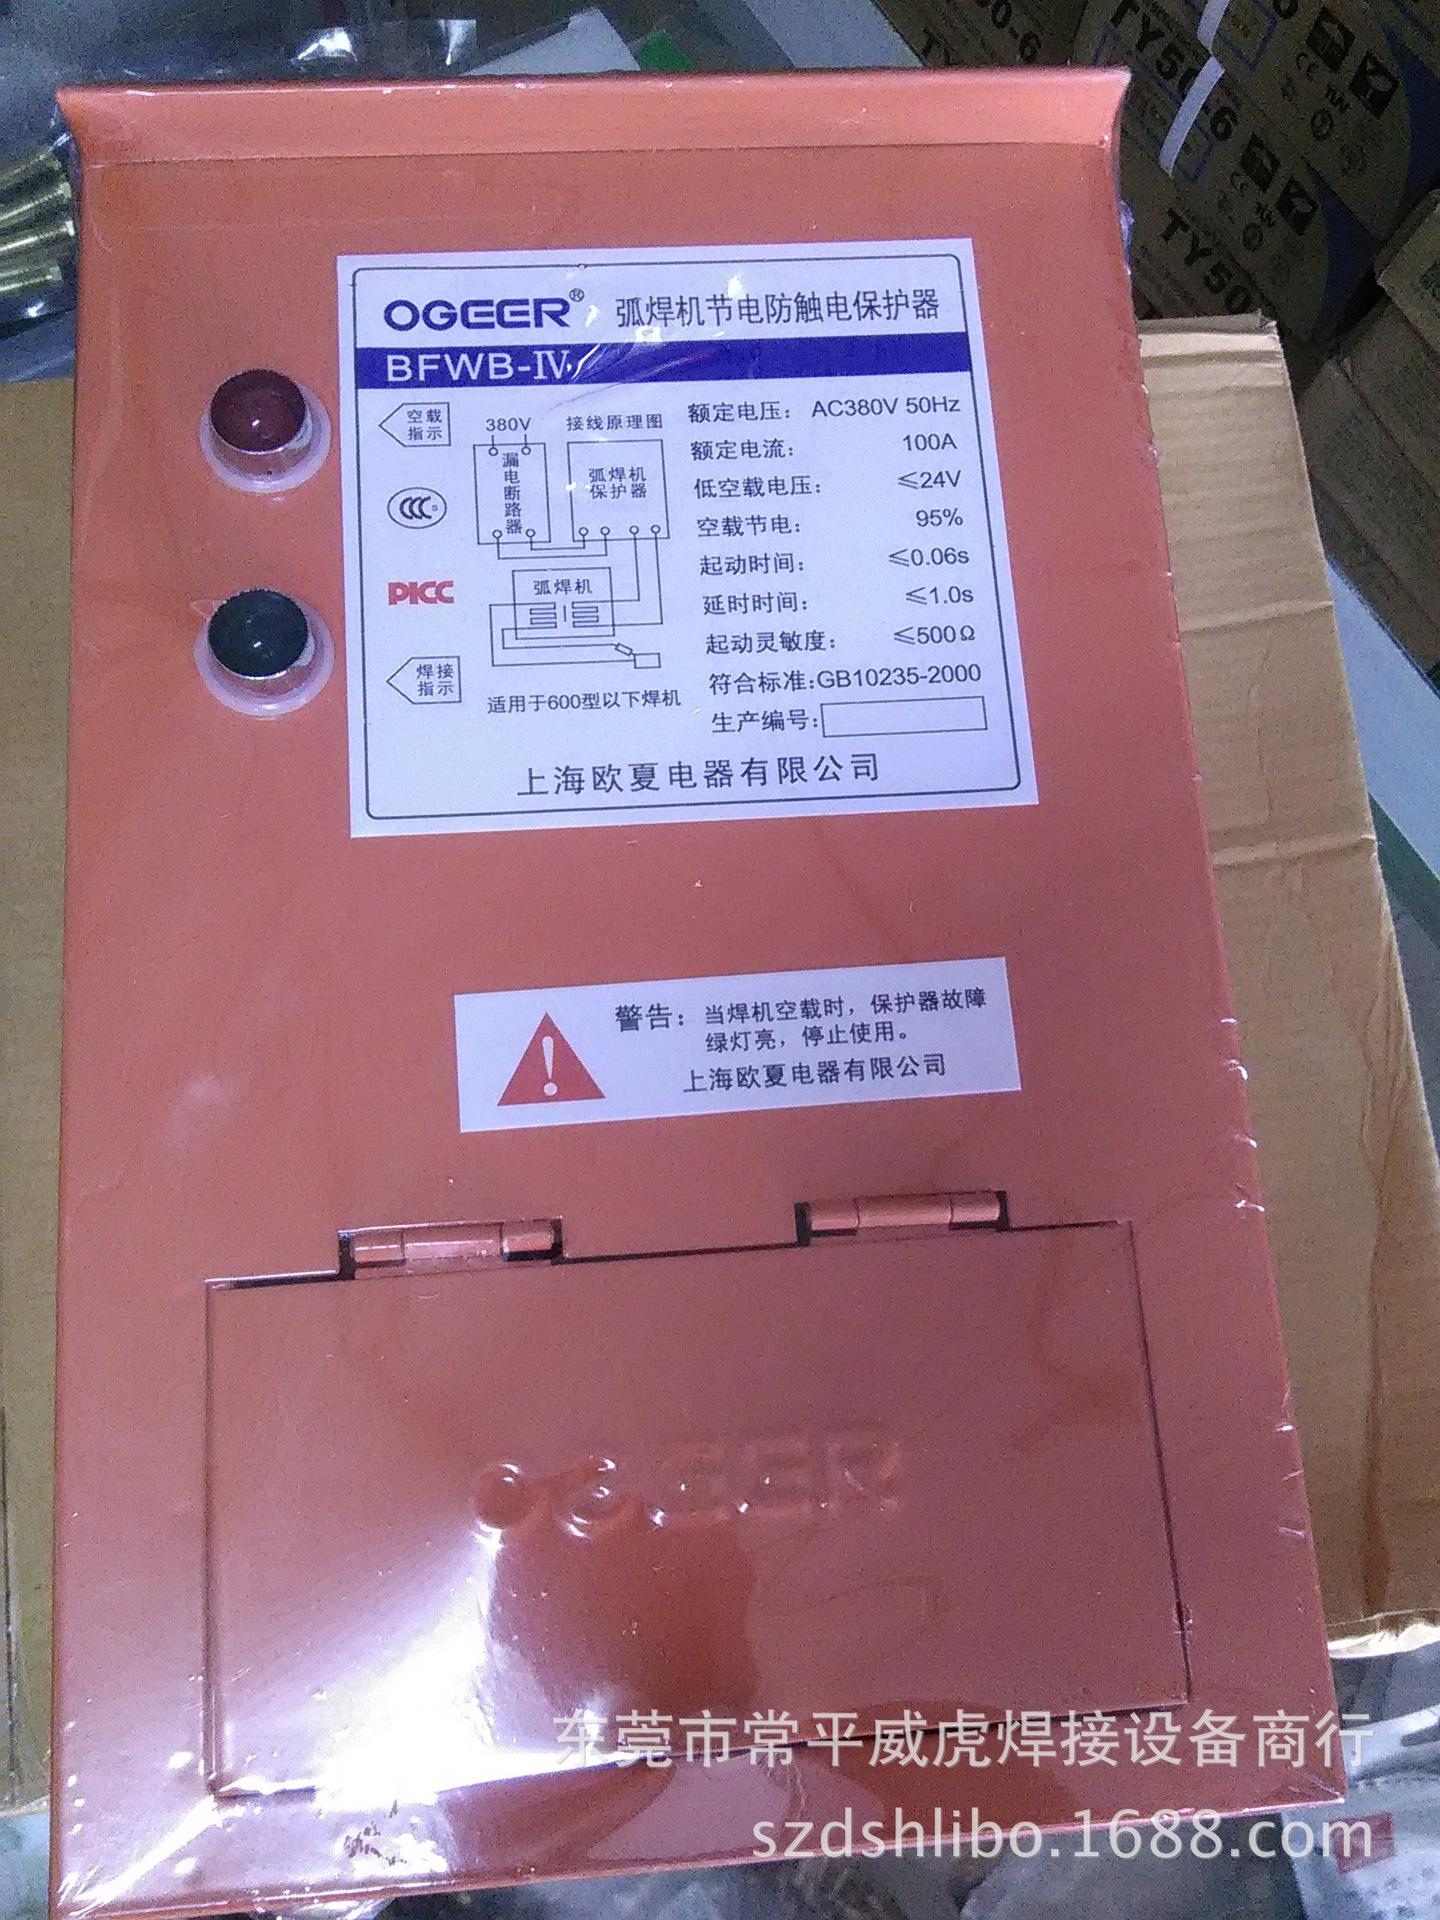 BFWB-IV弧焊机节电防触电?;て?上海欧夏焊机触电防护器